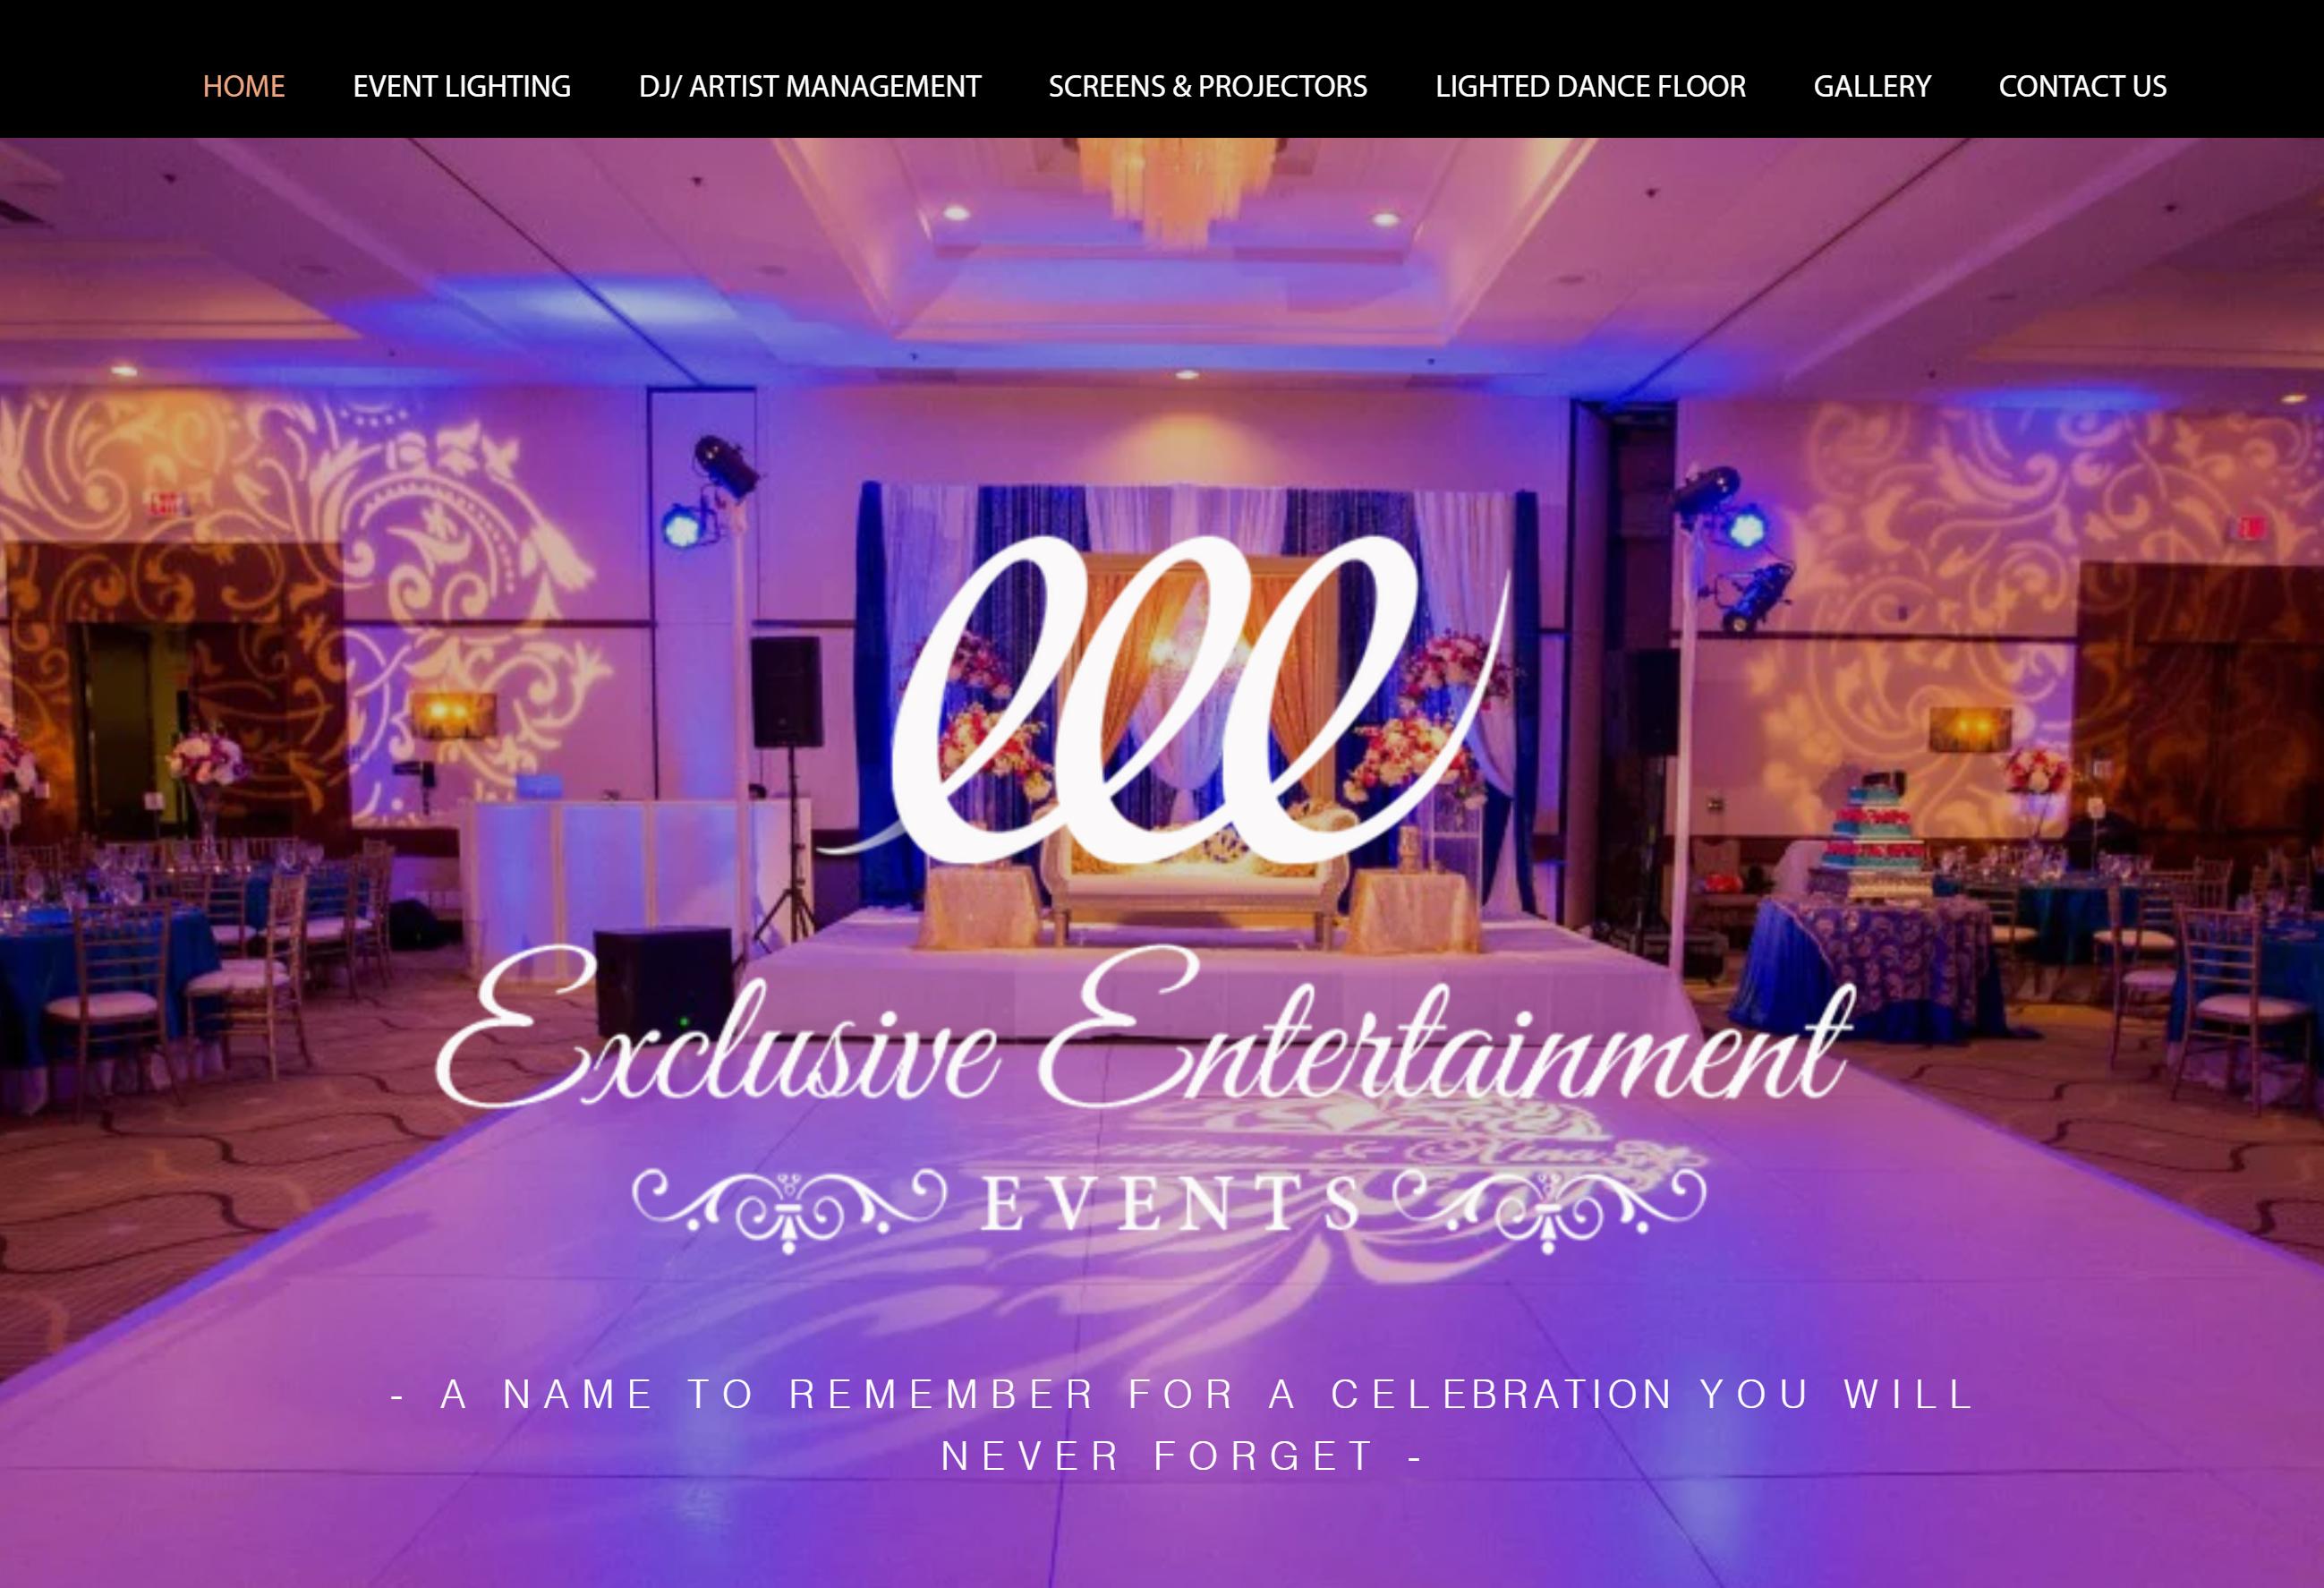 EXCLUSIVE ENTERTAINMENT EVENTS